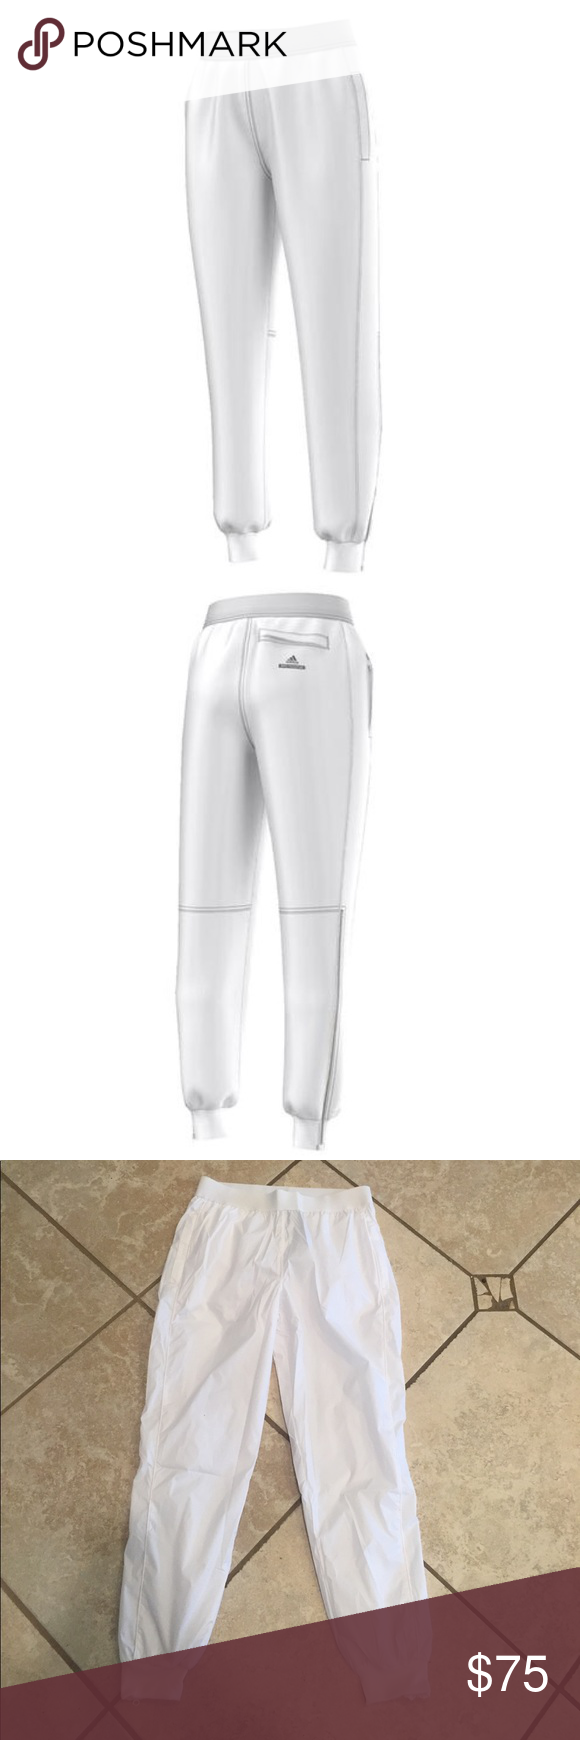 66007b5b8e1c 🎊NWT🎊 Adidas x Stella McCartney Barricade Pants The adidas Women s Stella  McCartney Barricade Tennis